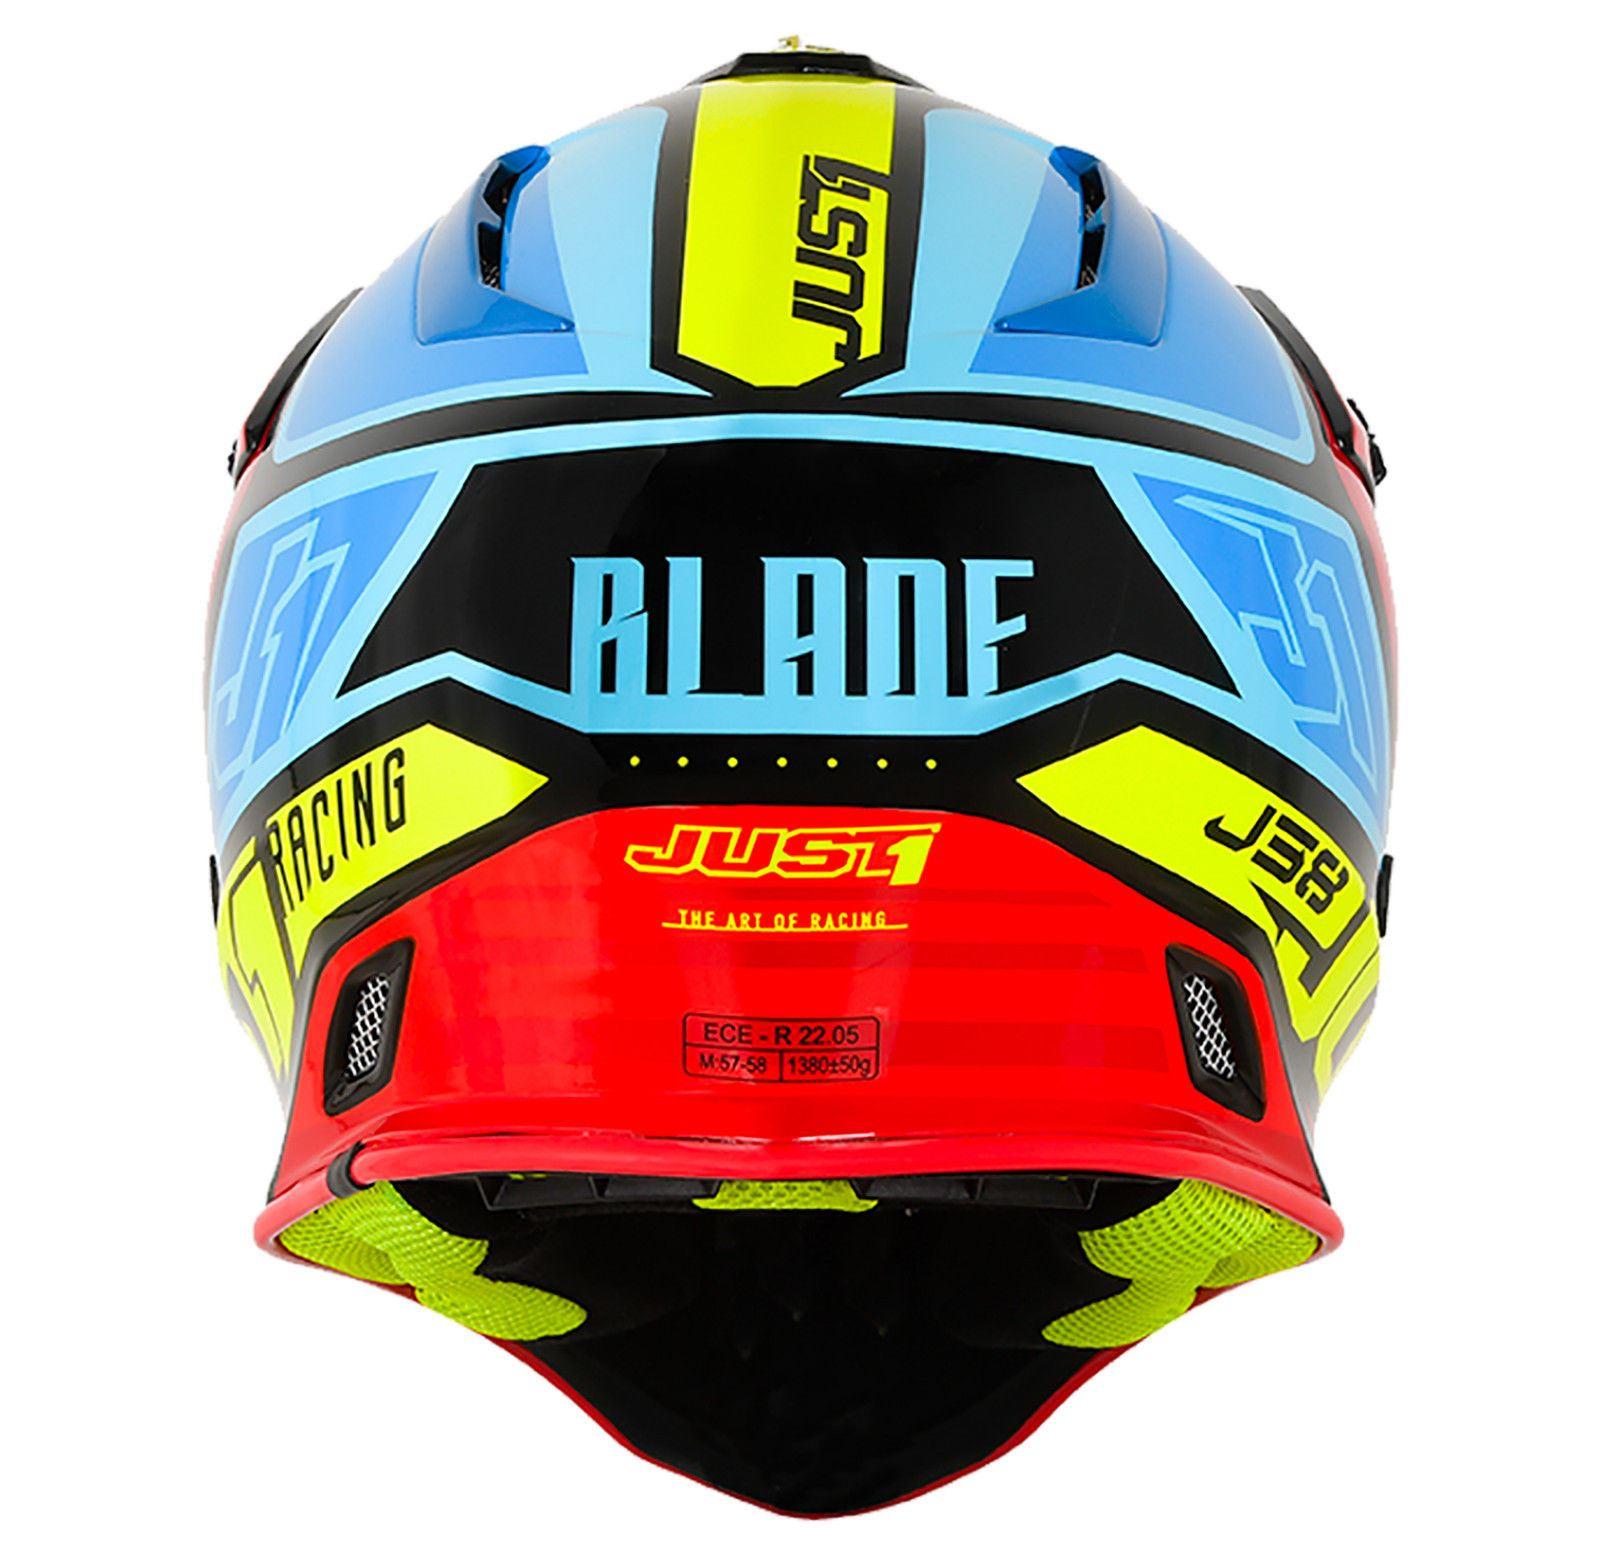 Just1-J38-Blade-Helmet-Motocross-Enduro-MX-ATV-Motorcycle-Off-Road-Full-Face-ACU thumbnail 13